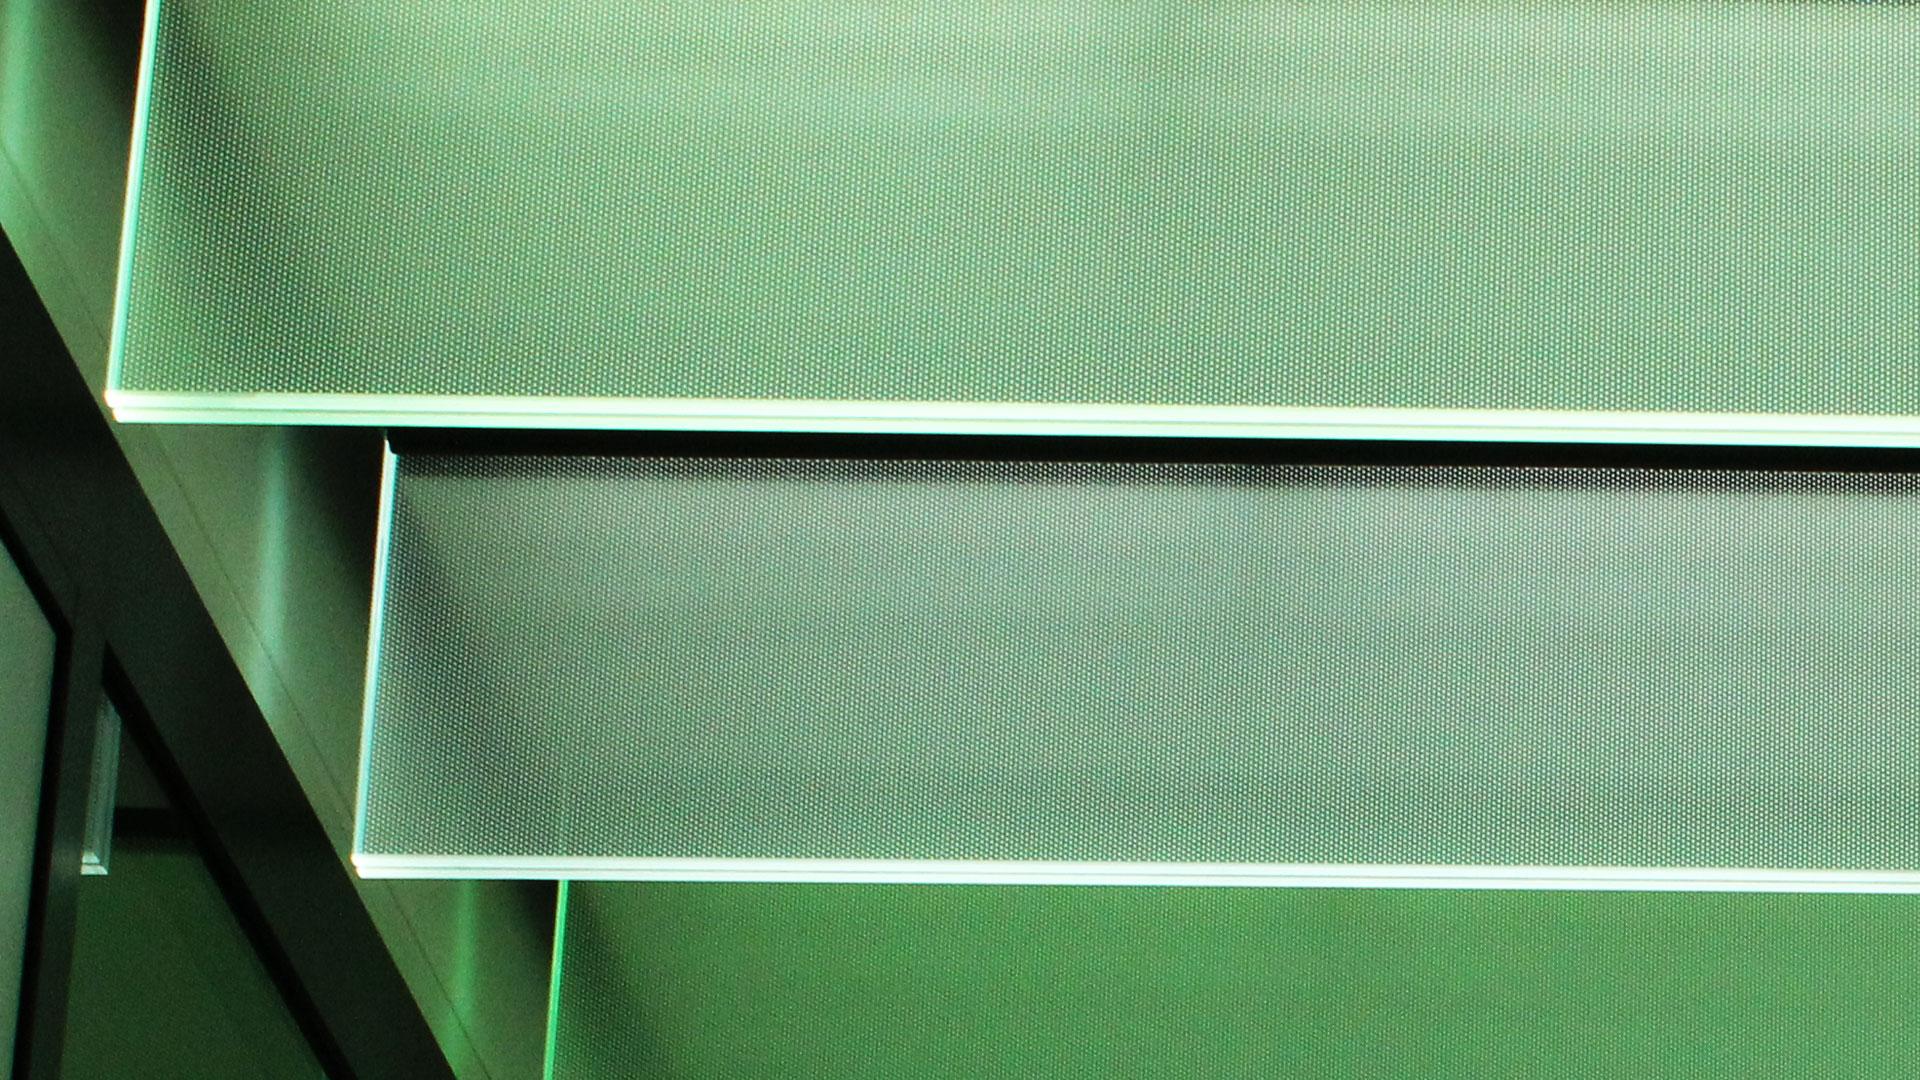 Bespoke glass fin SPI controlled ceiling light feature | Bespoke lighting design | The Light Lab